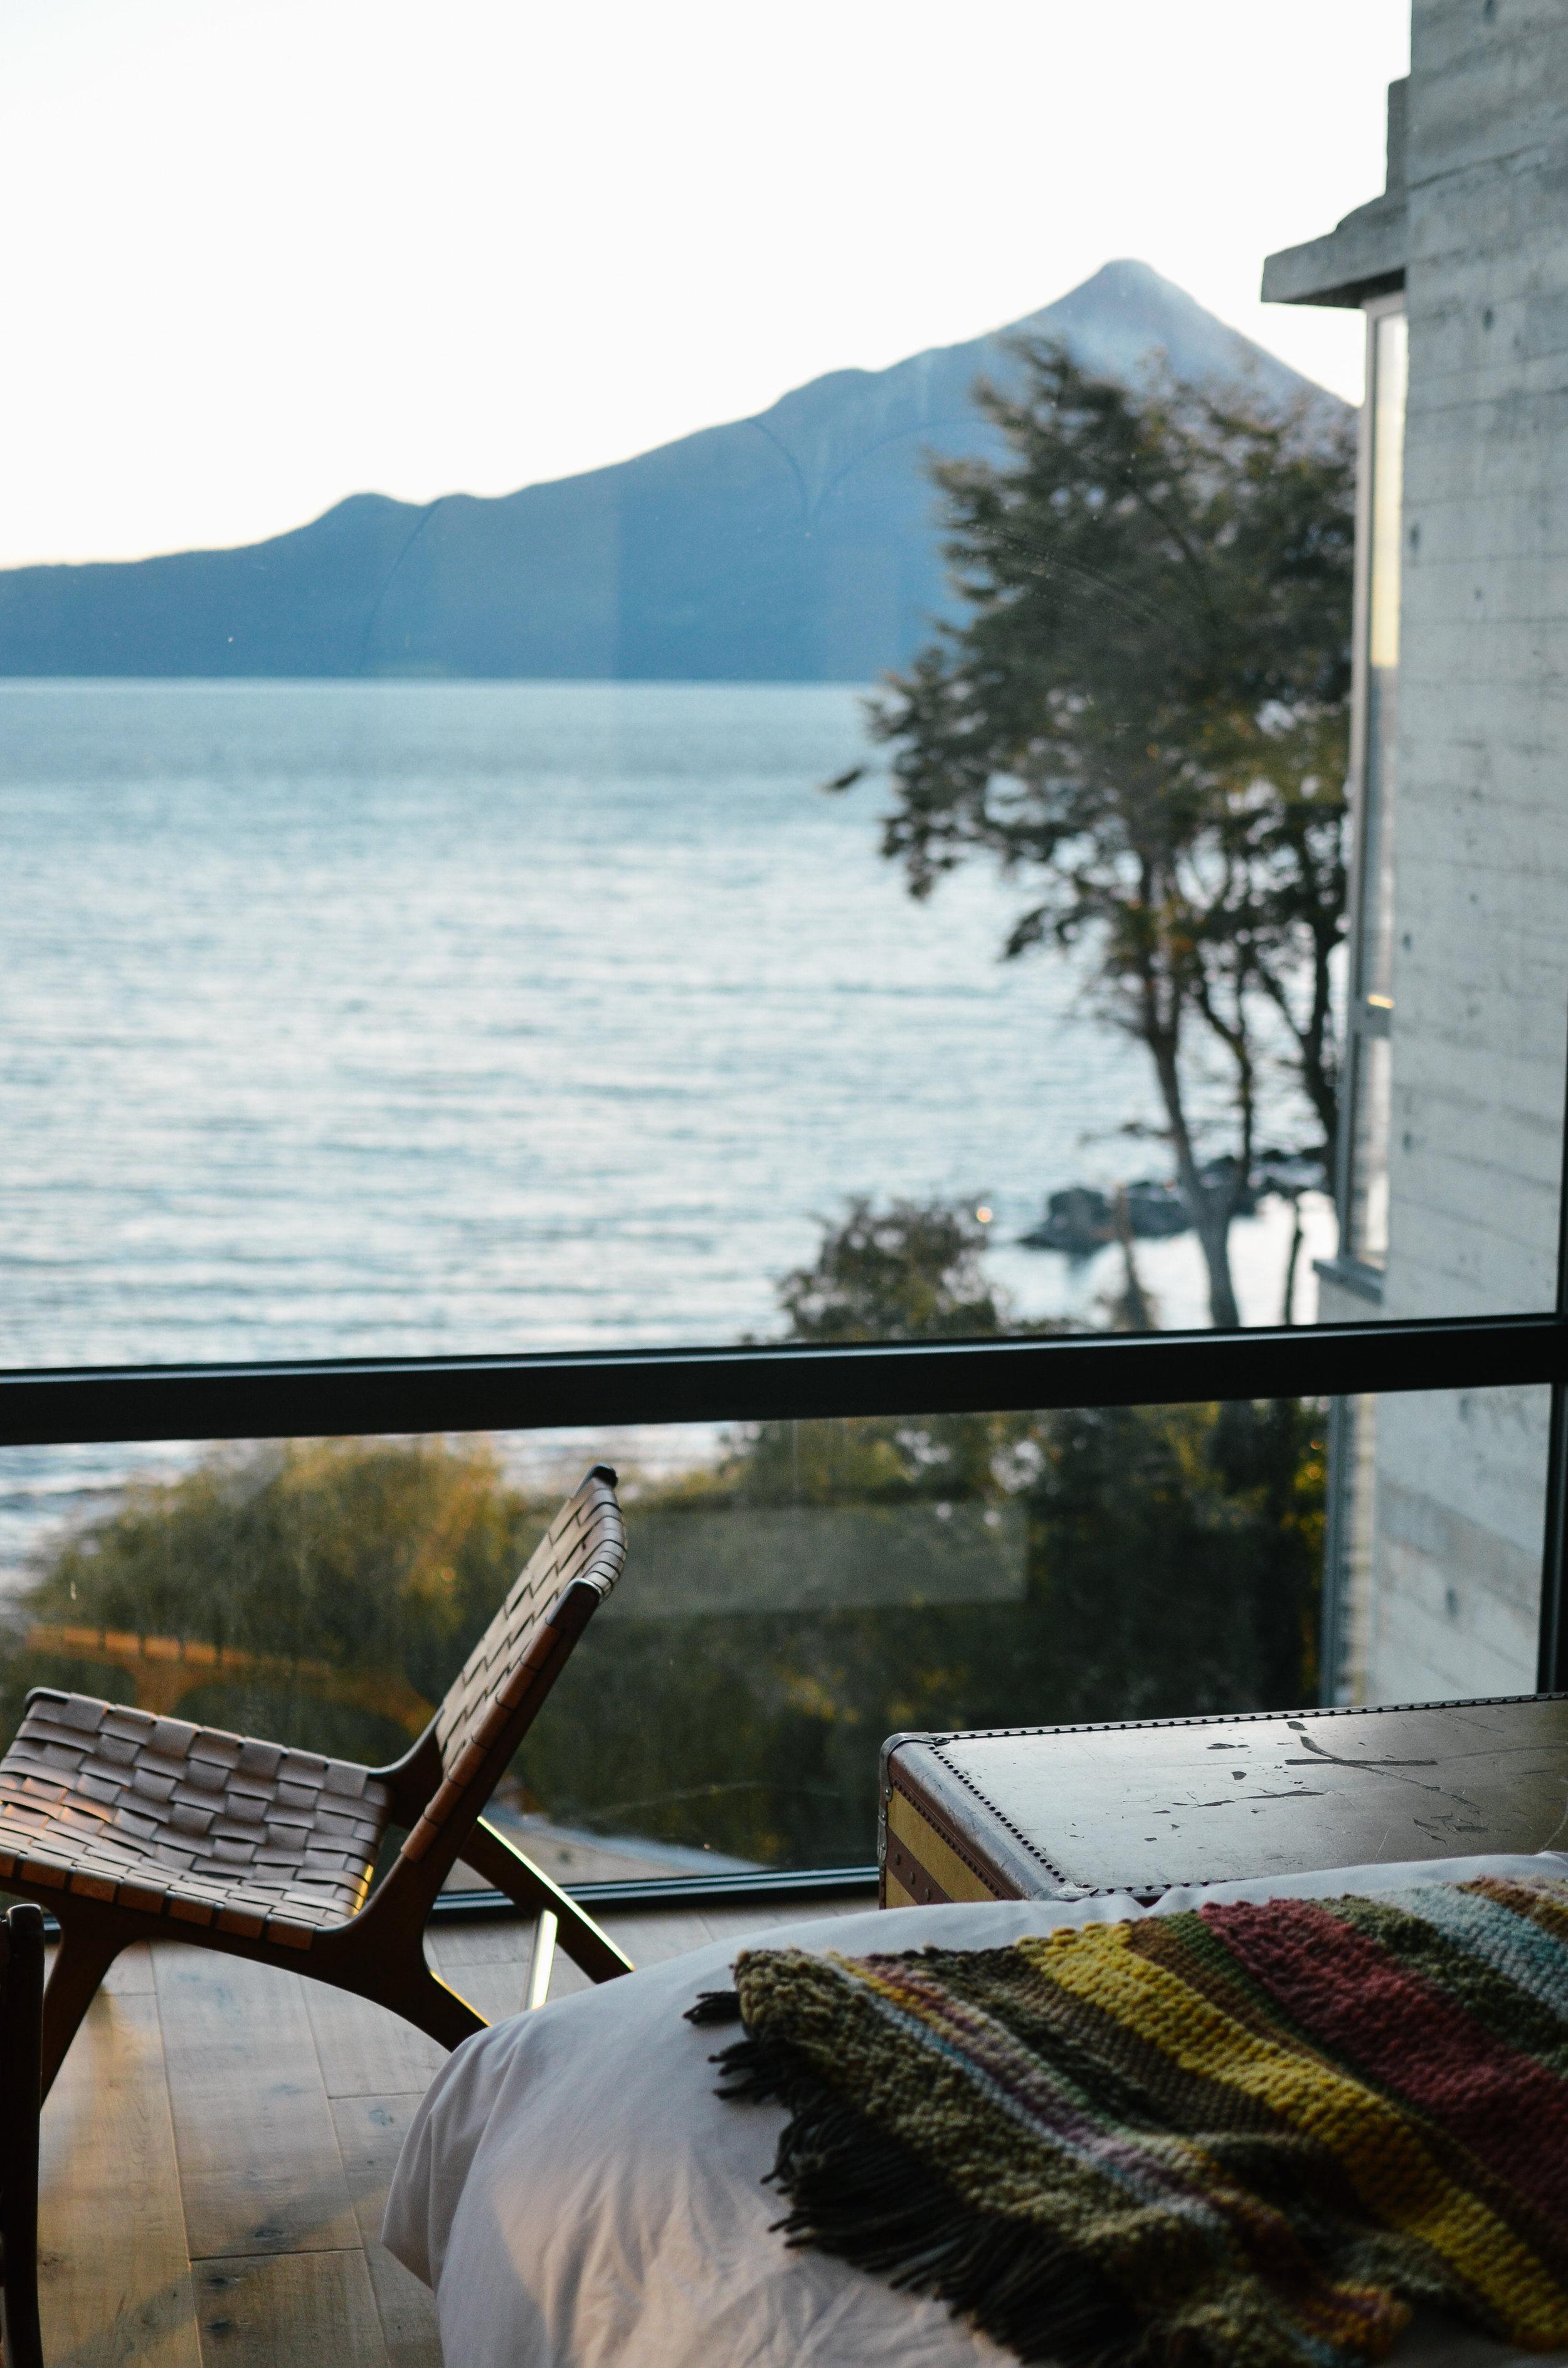 chile+awa+hotel+travel+guide+life+on+pine_DSC_1274.jpg